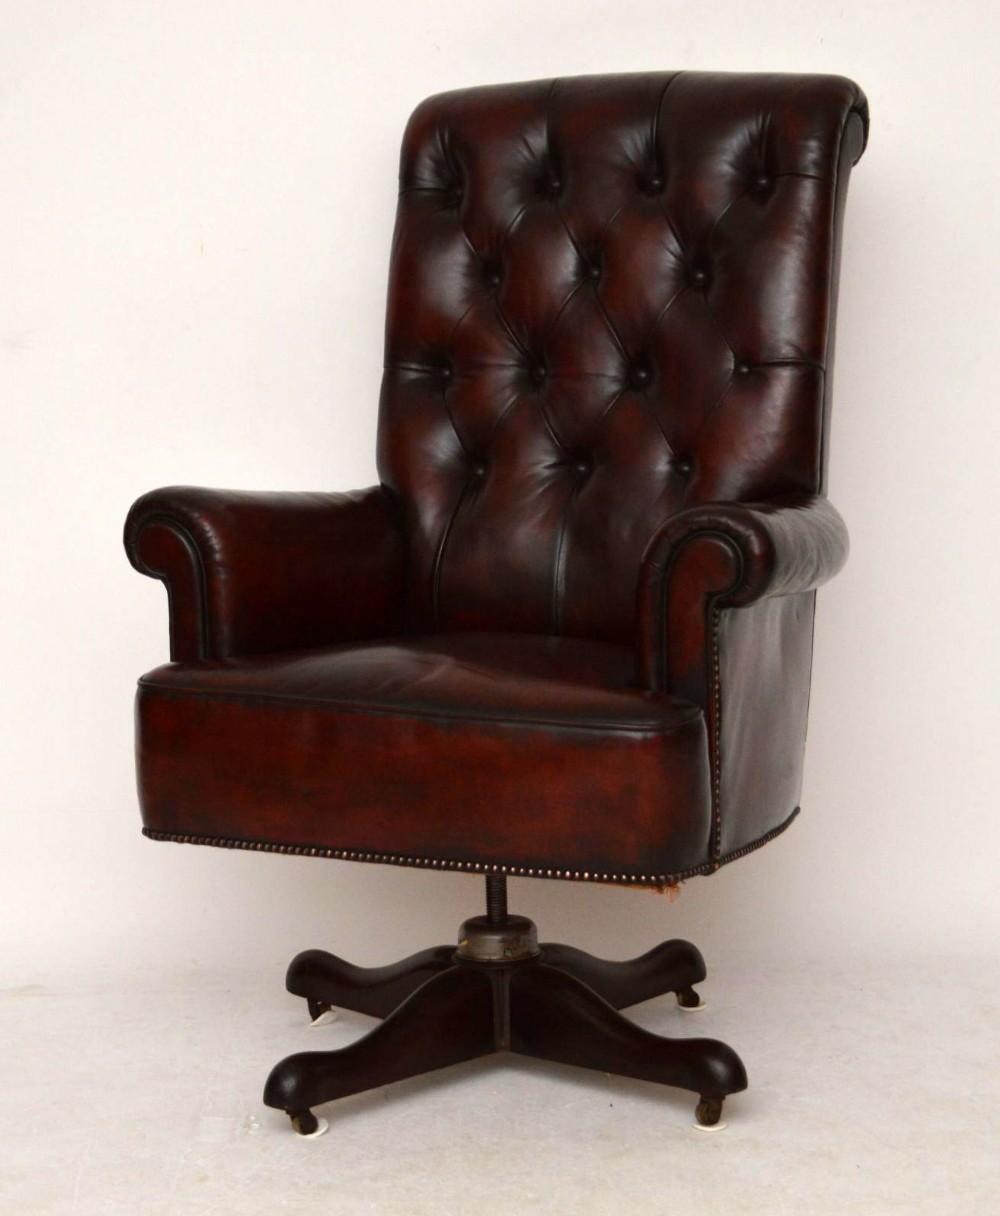 large antique leather swivel desk armchair - Large Antique Leather Swivel Desk Armchair 293354